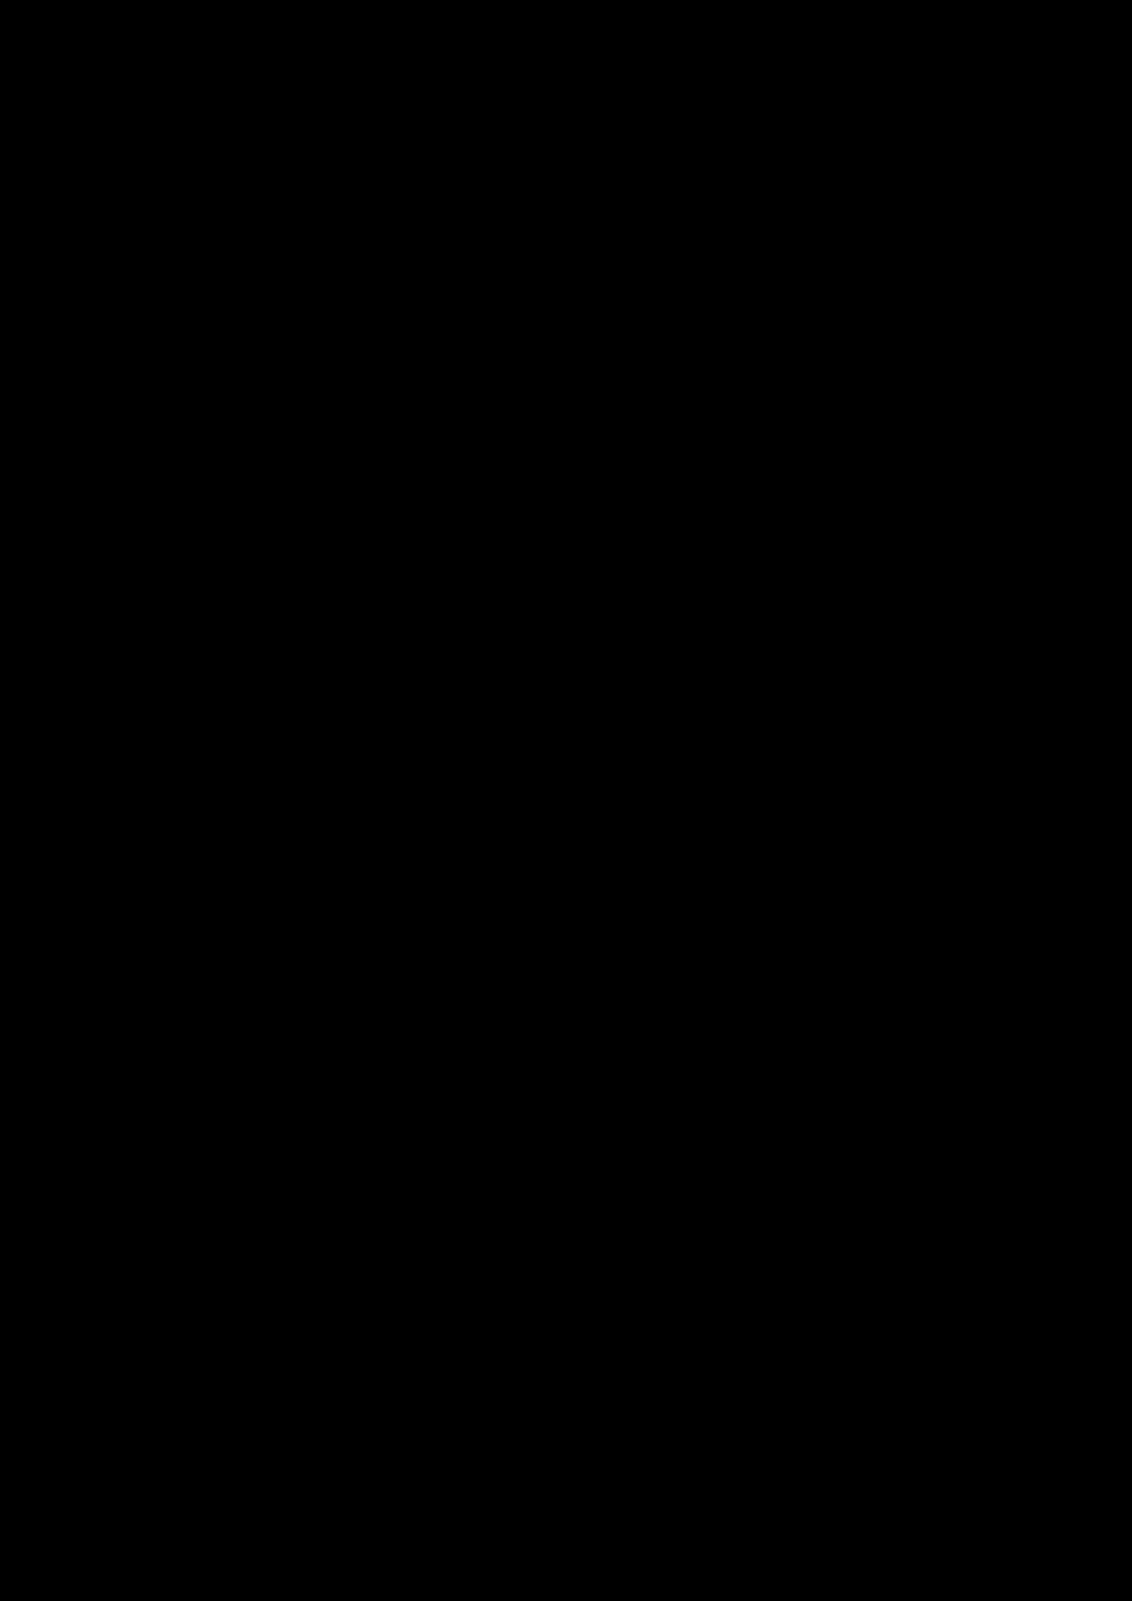 Belyiy sokol slide, Image 78